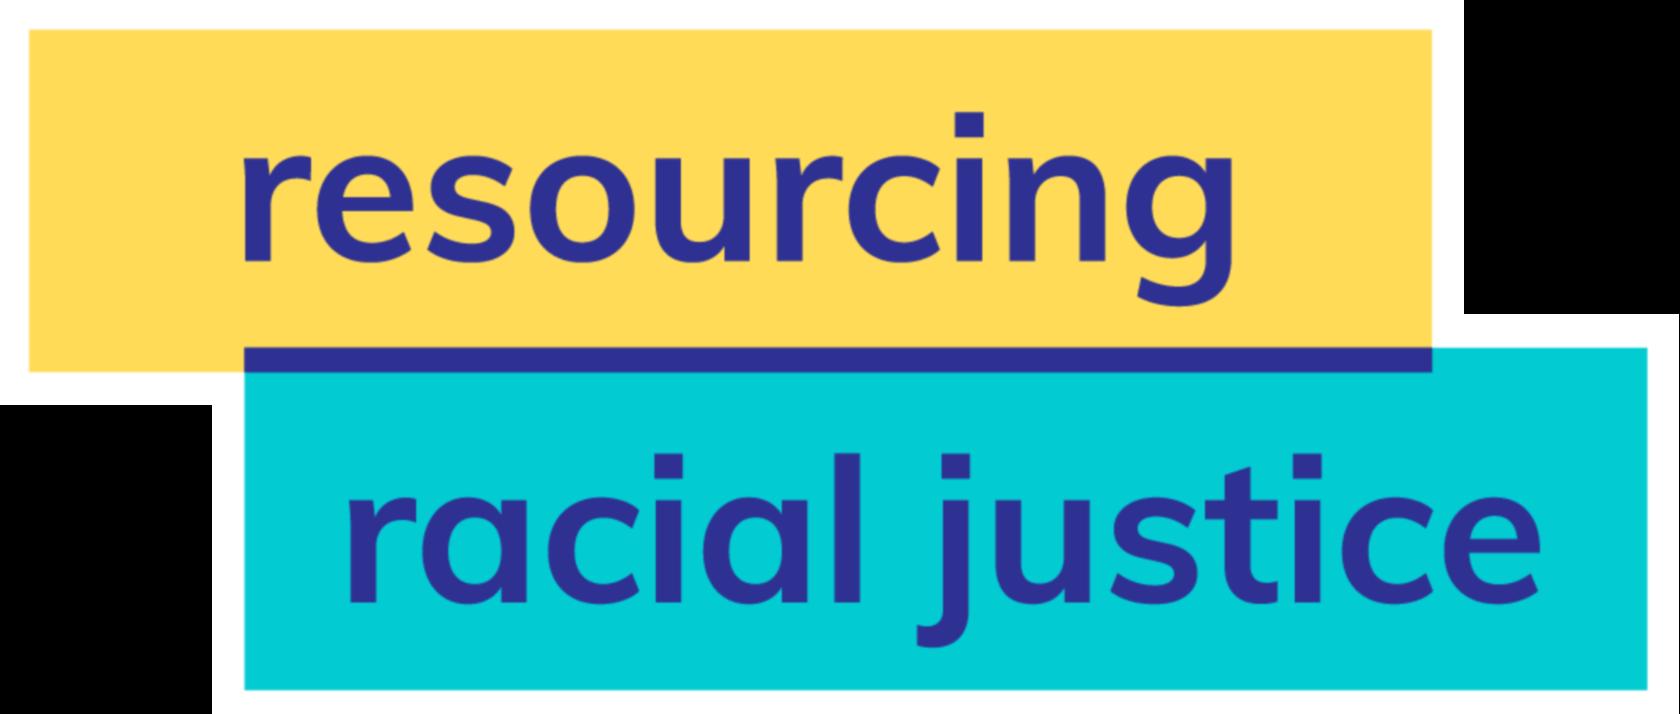 Resourcing Racial Justice